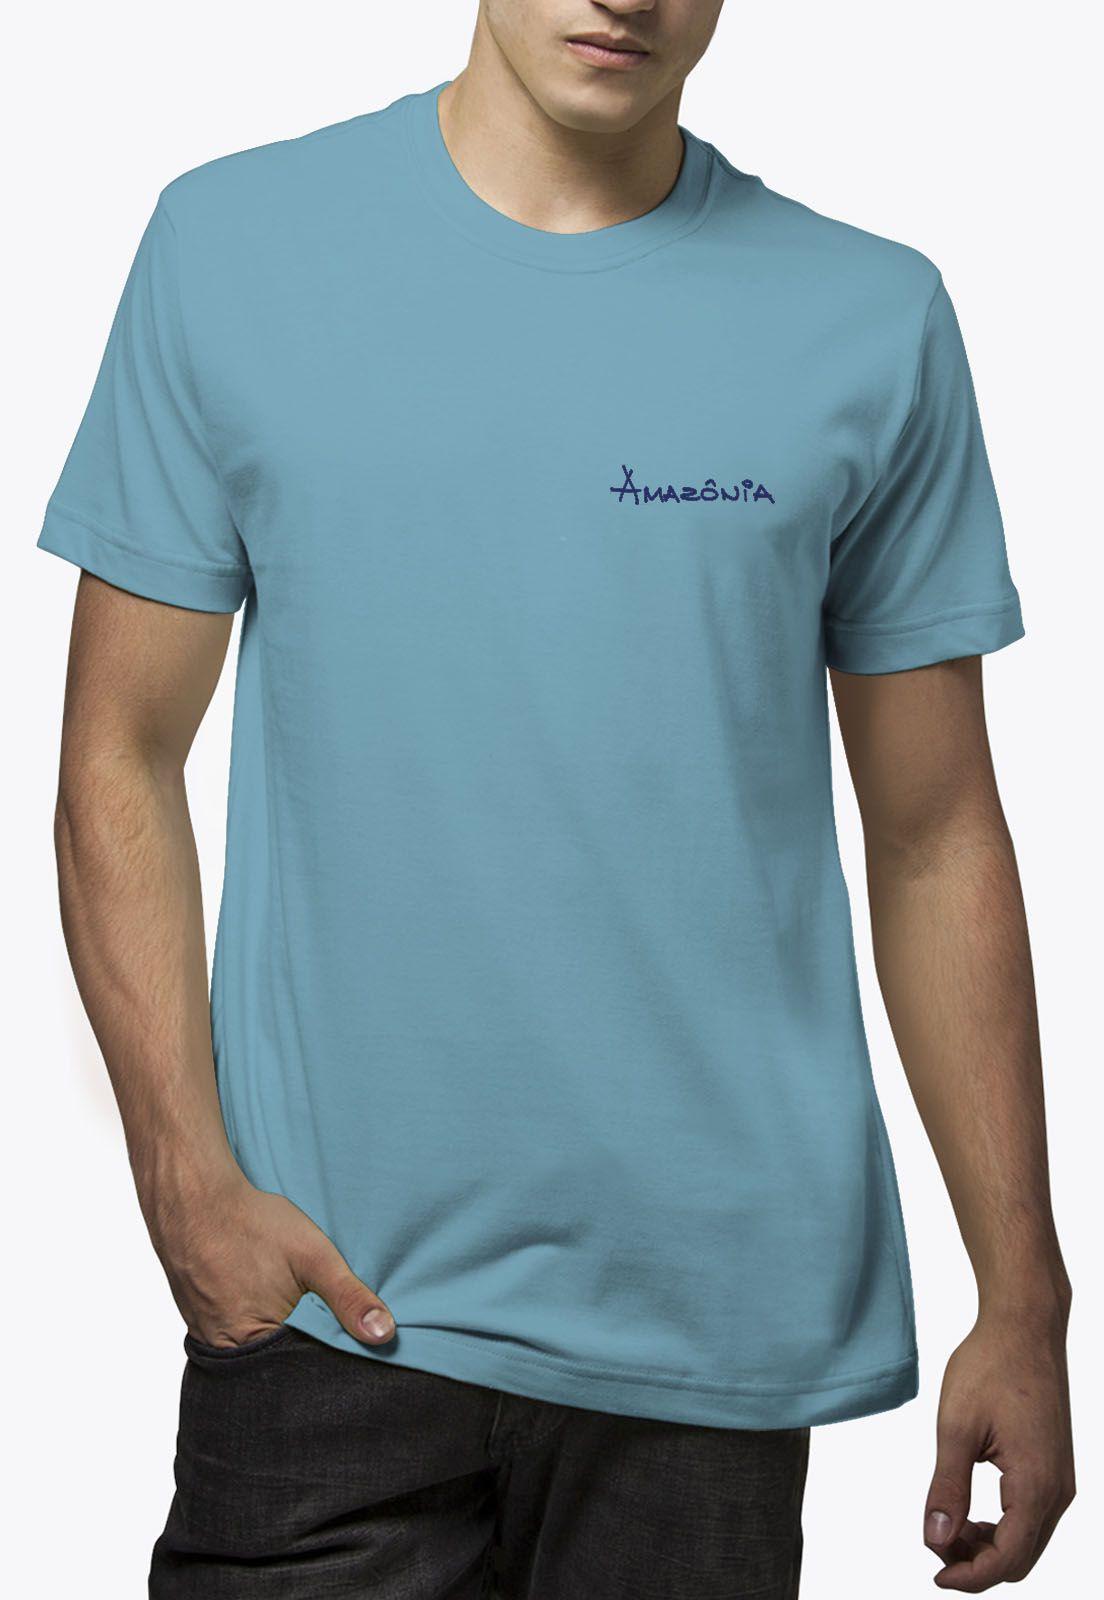 Camiseta Amazônia Gota Indígena - Azul